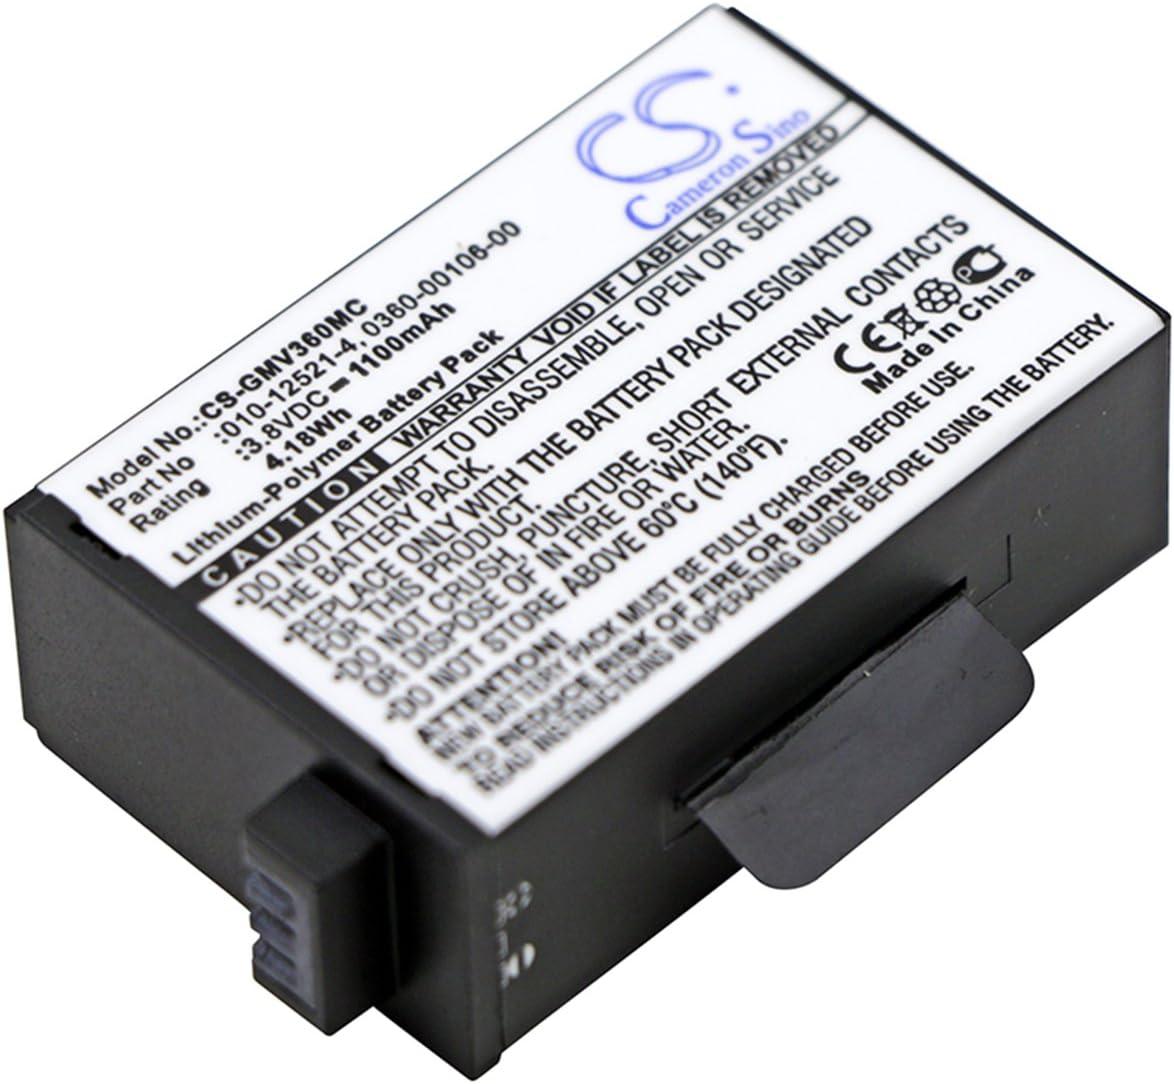 VINTRONS 1100mAh Battery for Garmin Virb 360,